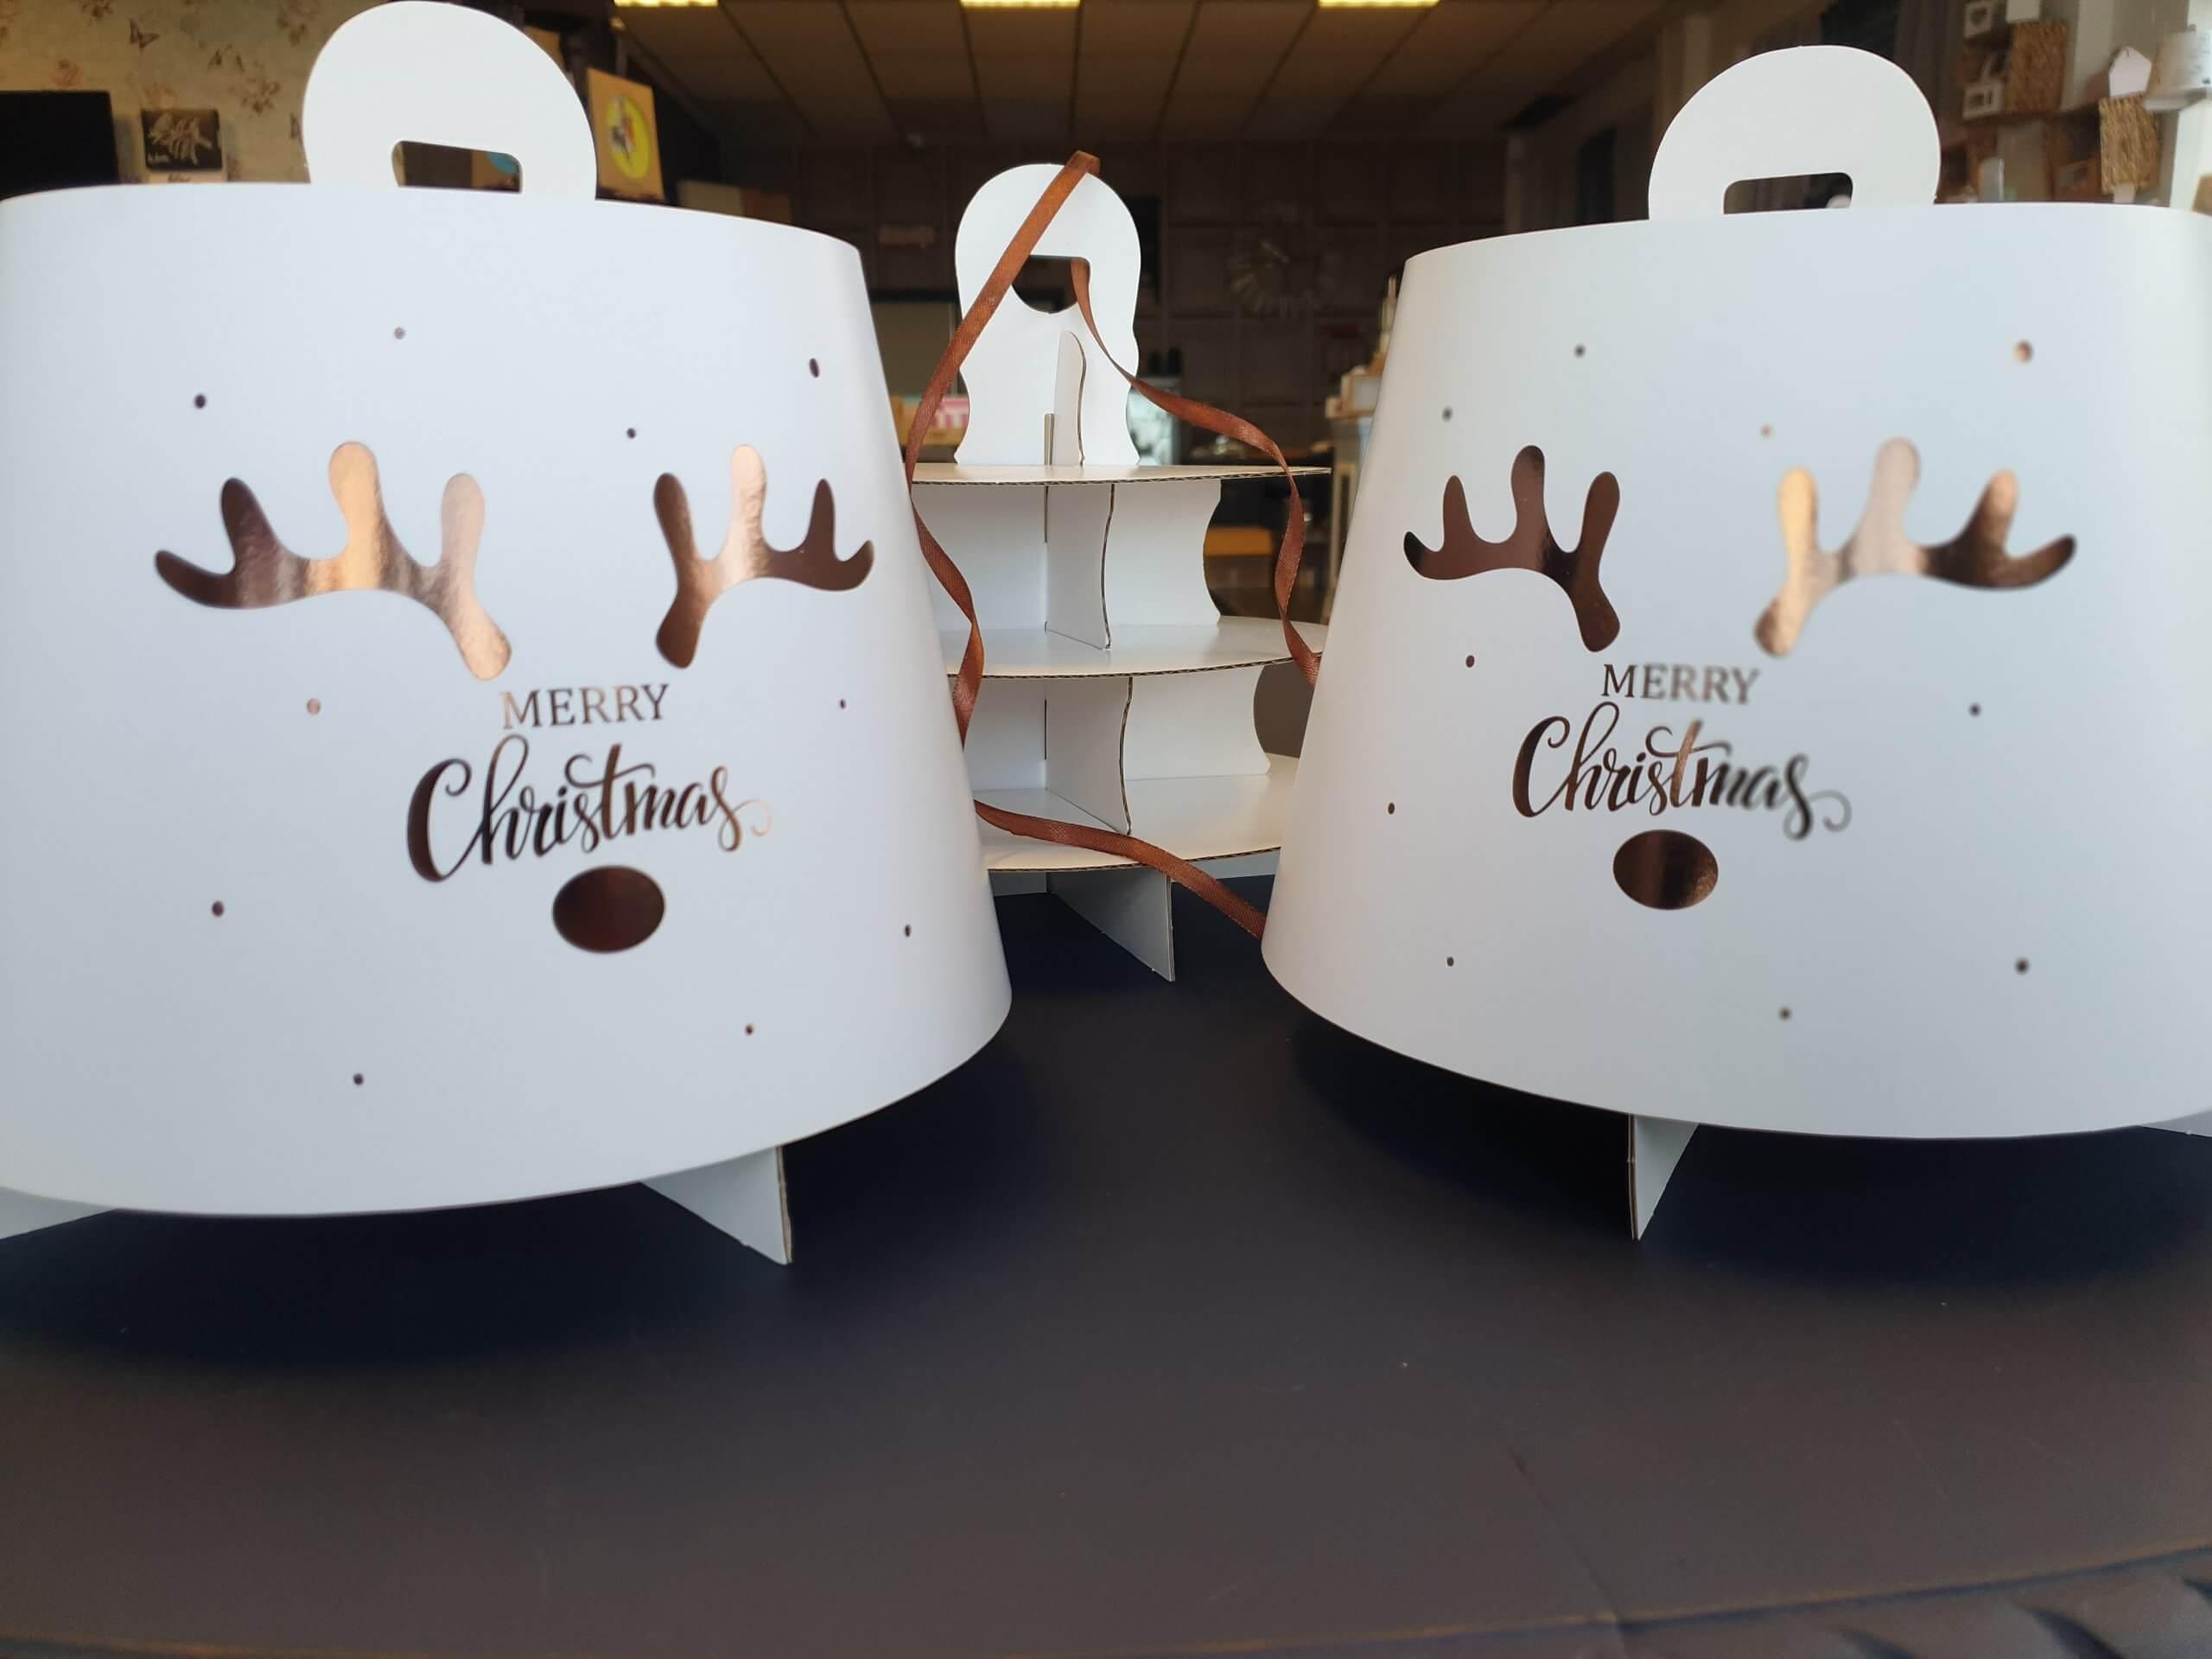 Hot Foil Christmas Antler Design 3 Tier Afternoon Tea Caddy